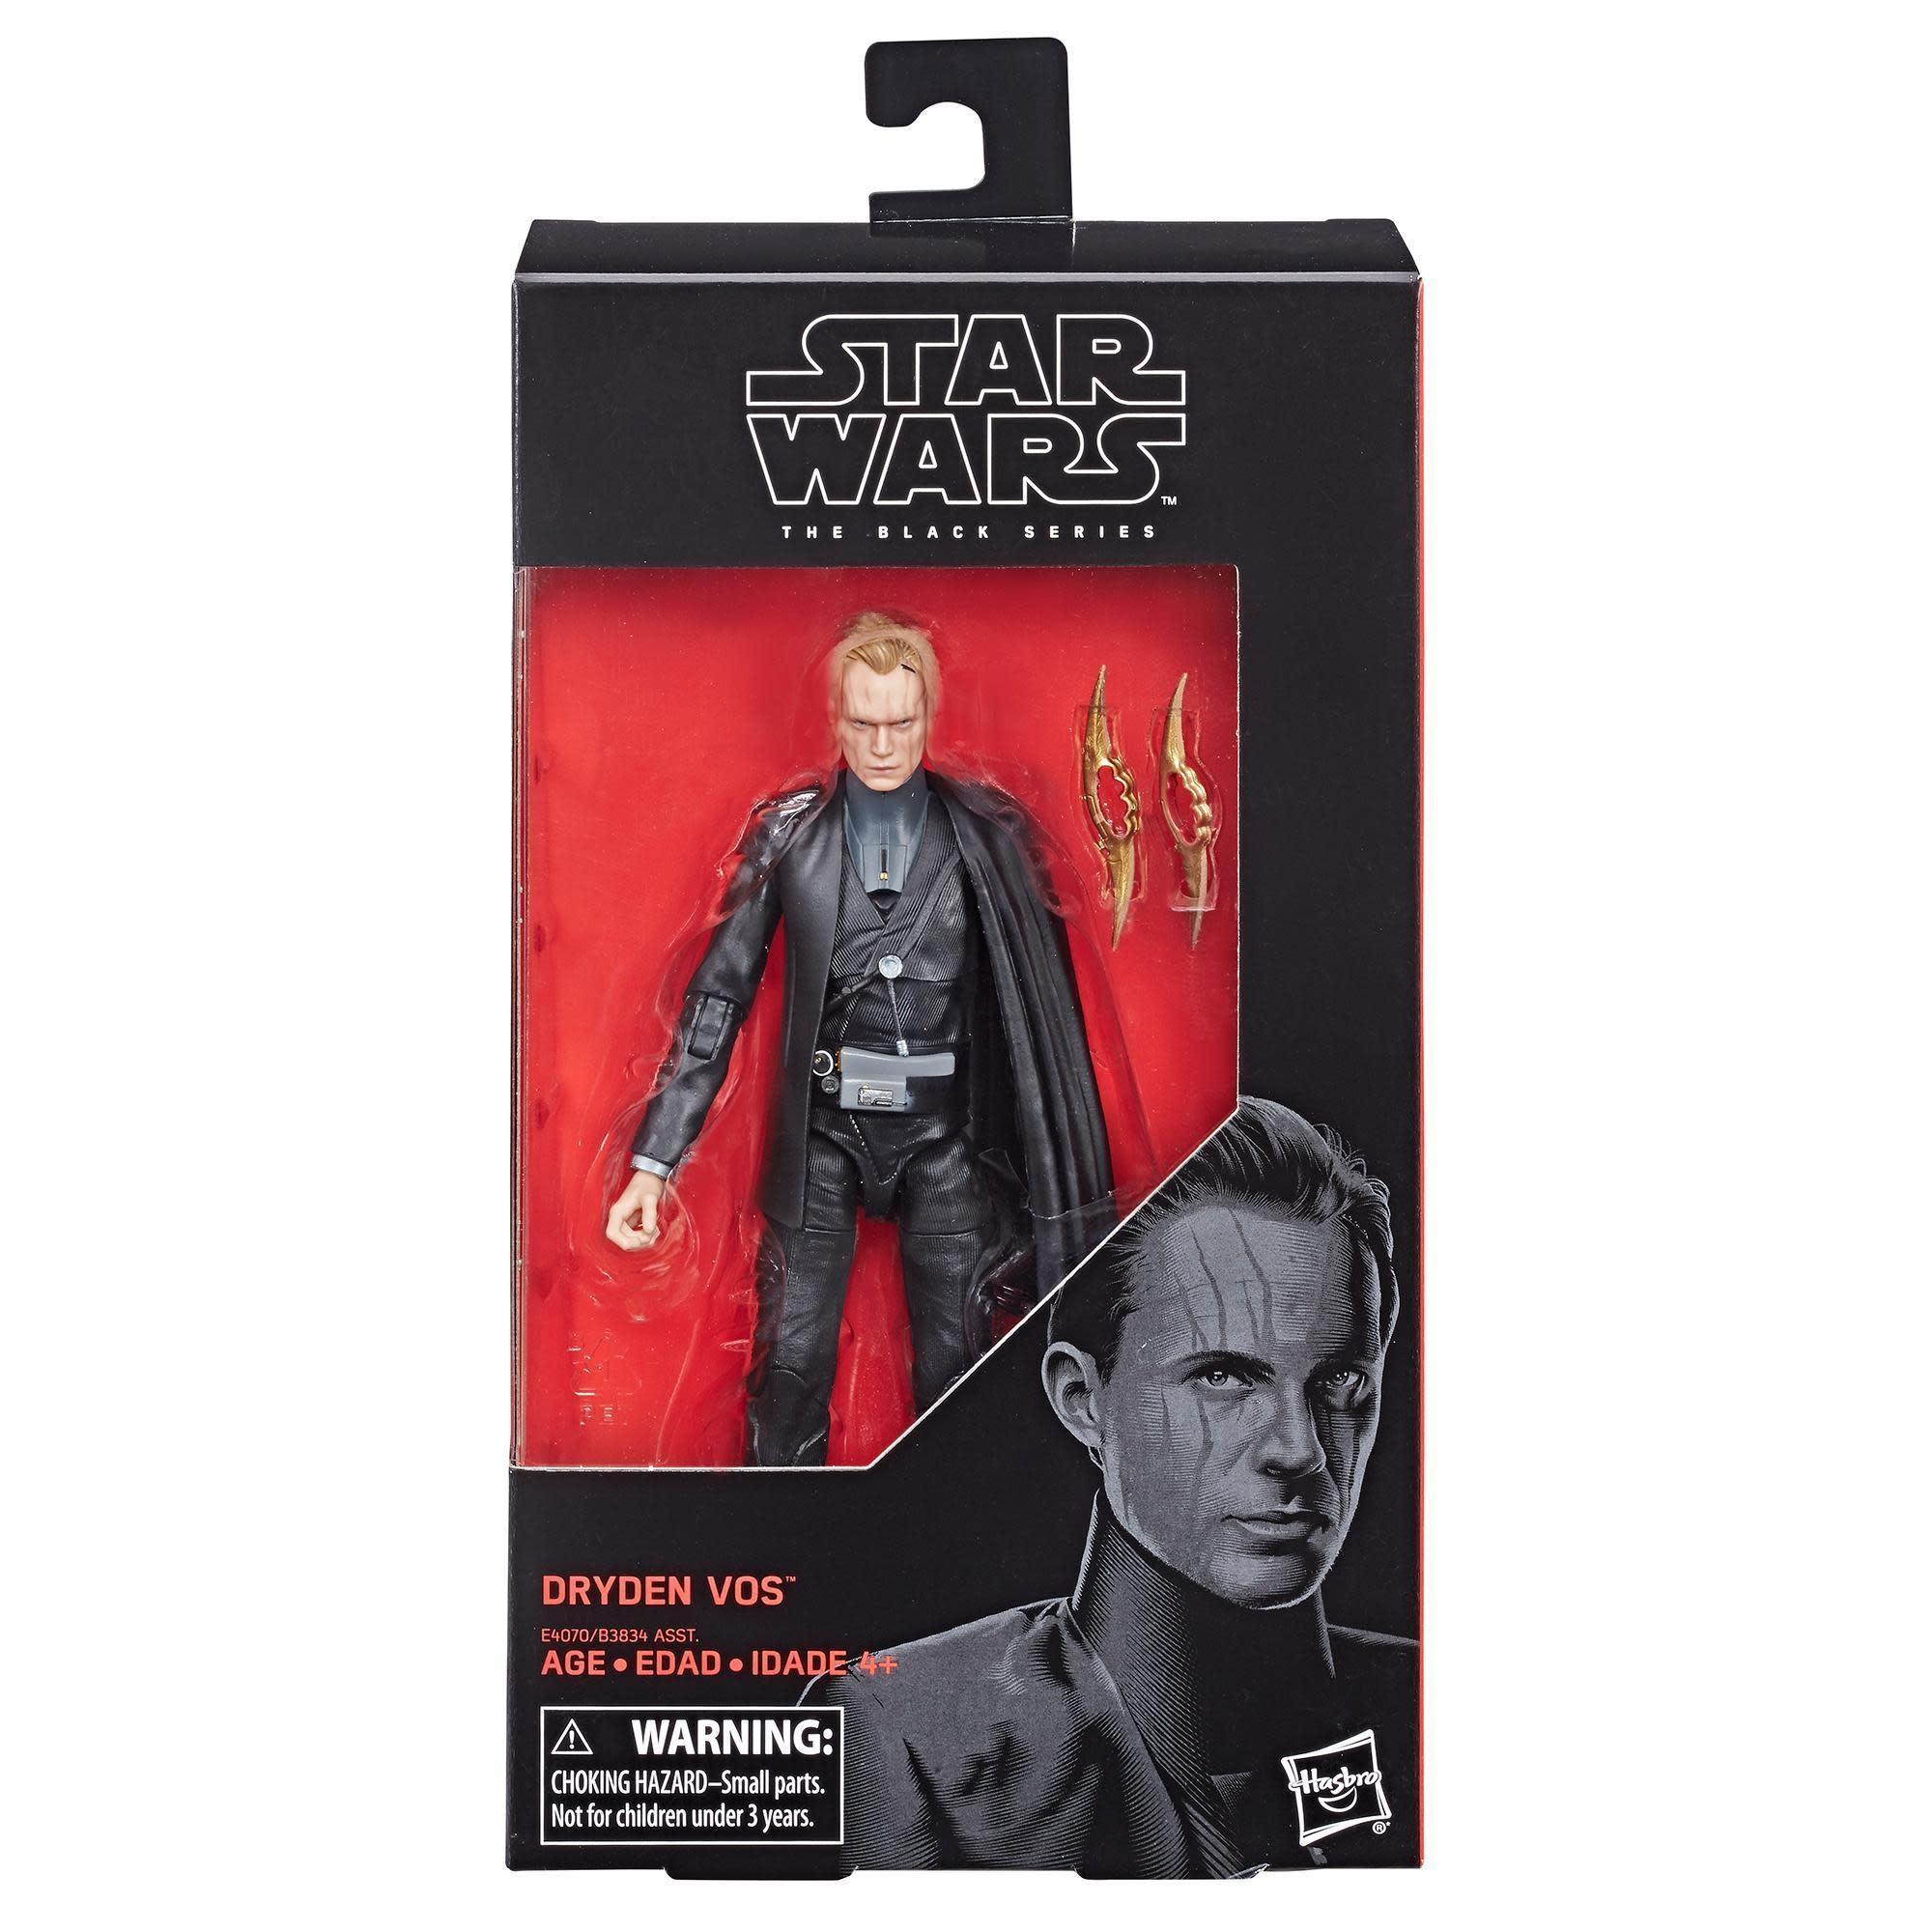 "Hasbro Star Wars Black Series: Dryden Voss 6"" Figure"